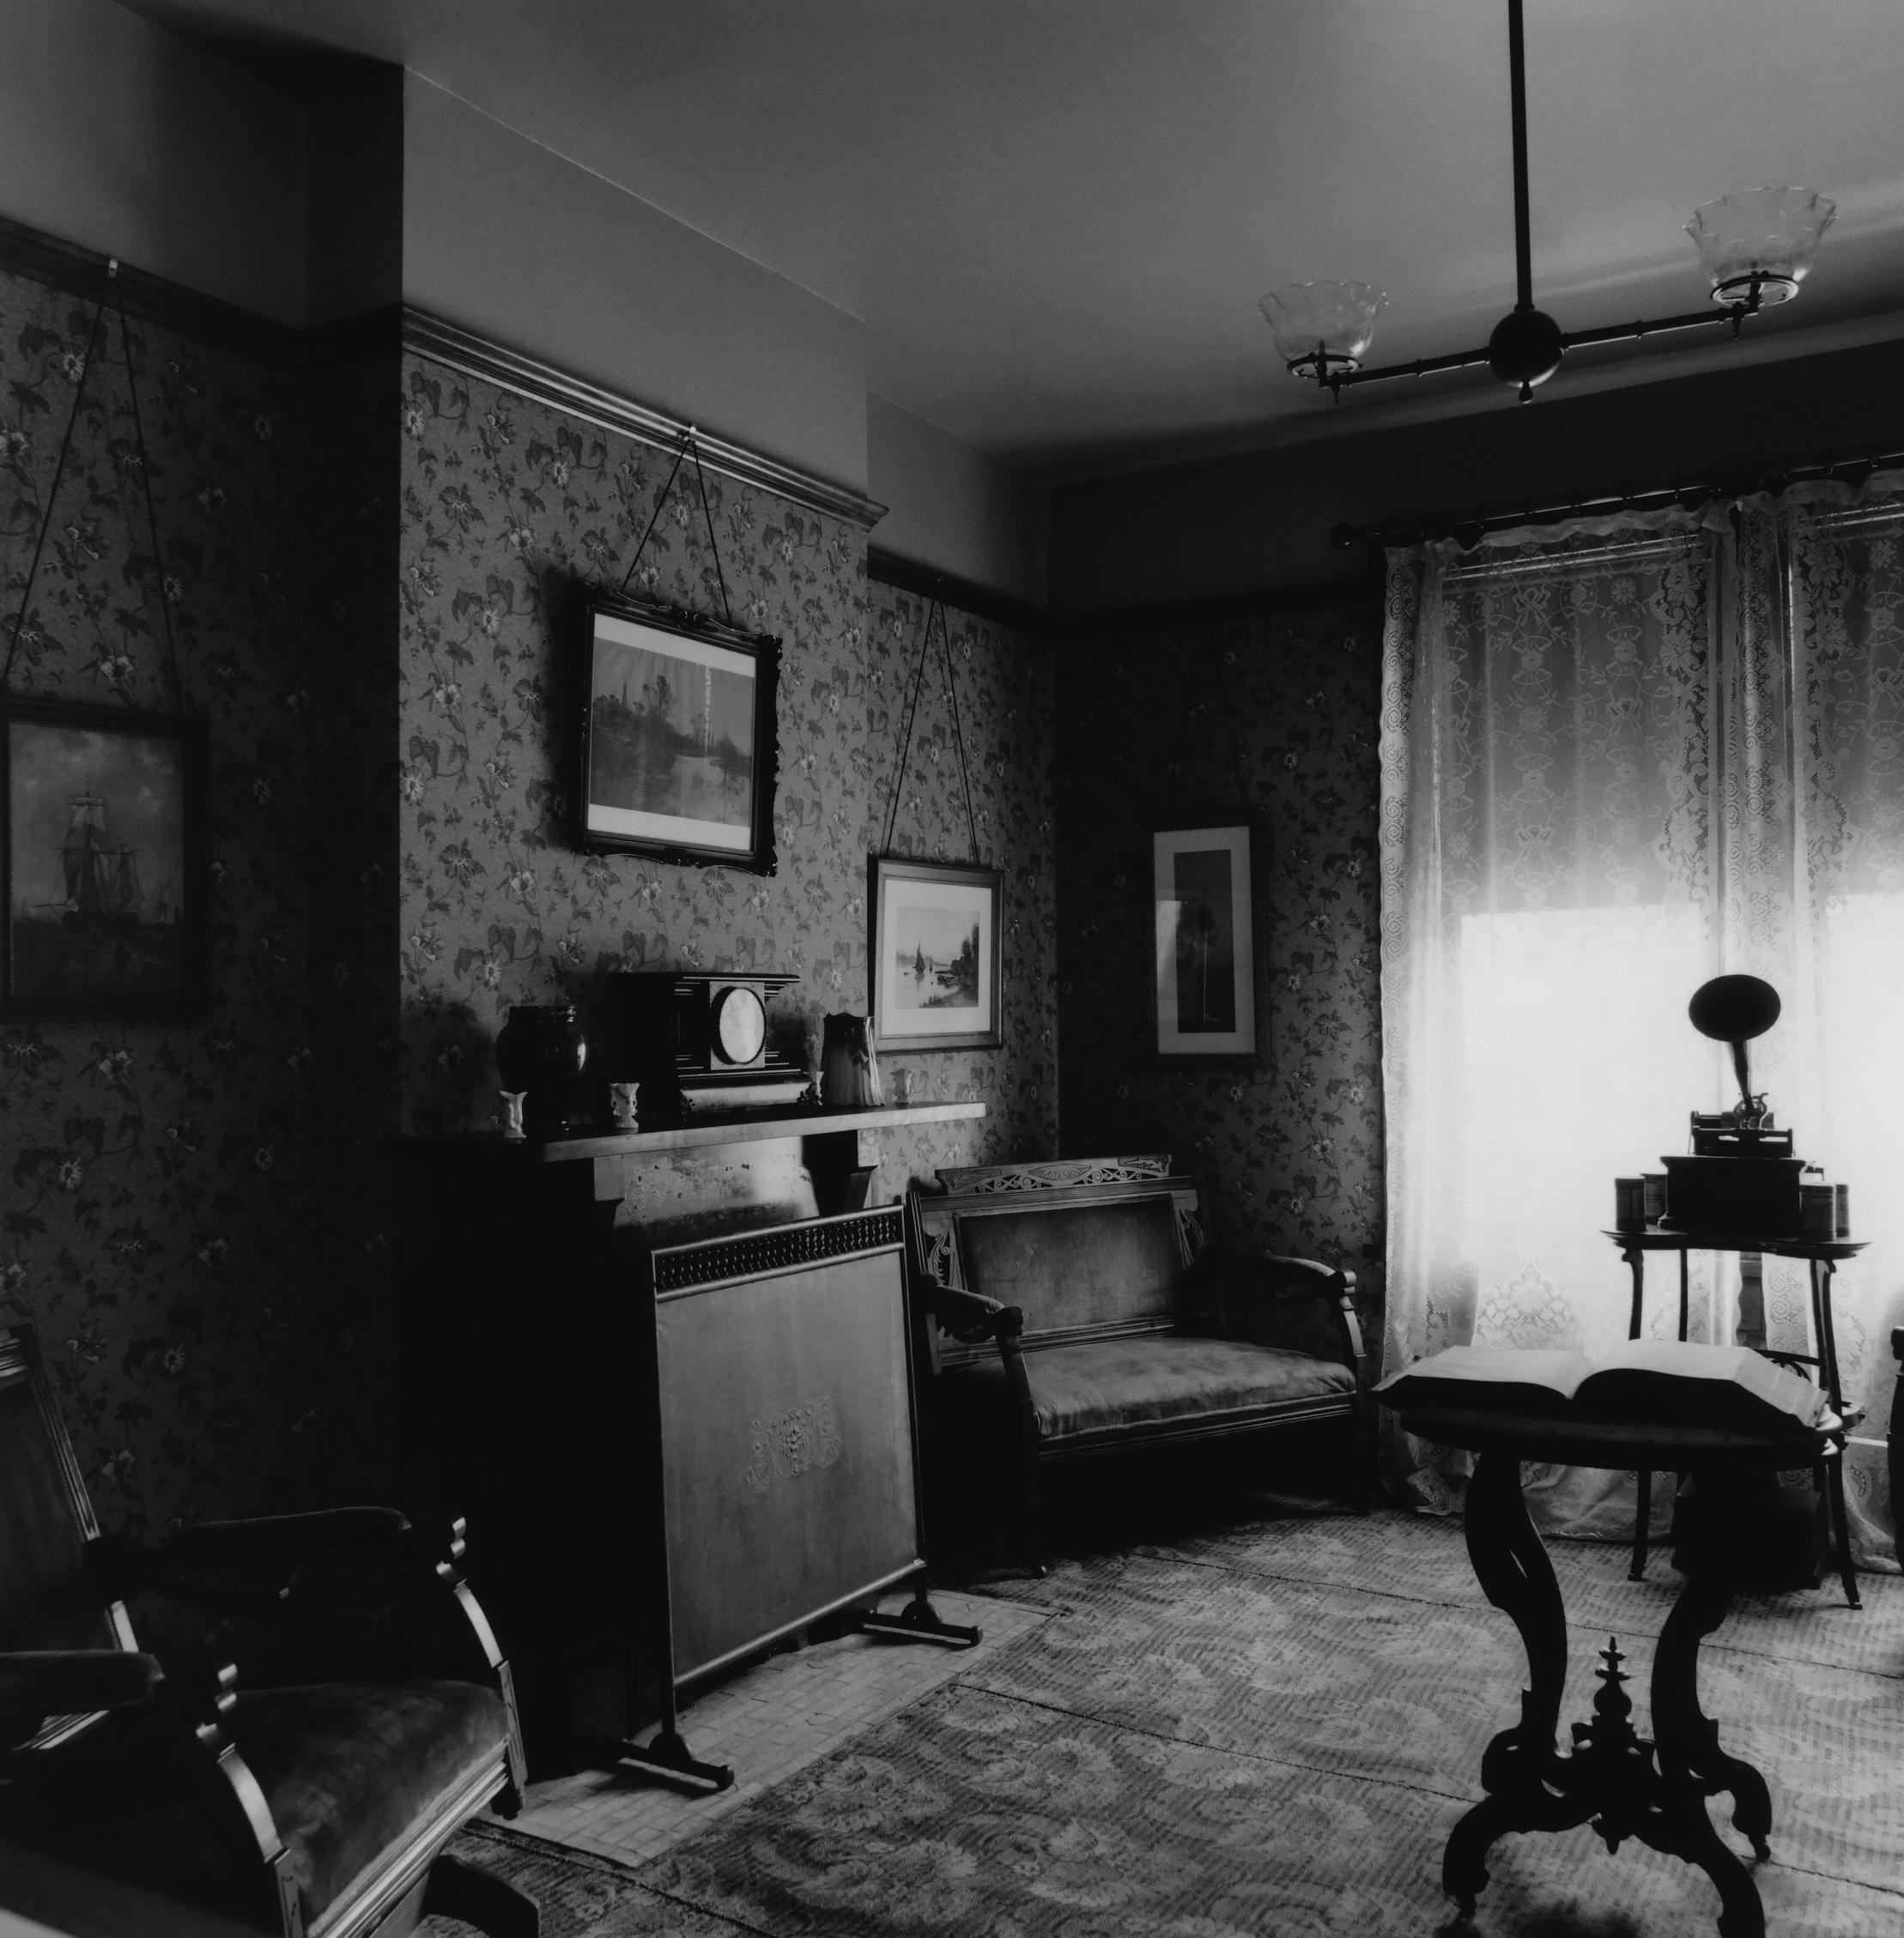 Paul Lawrence House (Interior), Dayton, Ohio, 1995